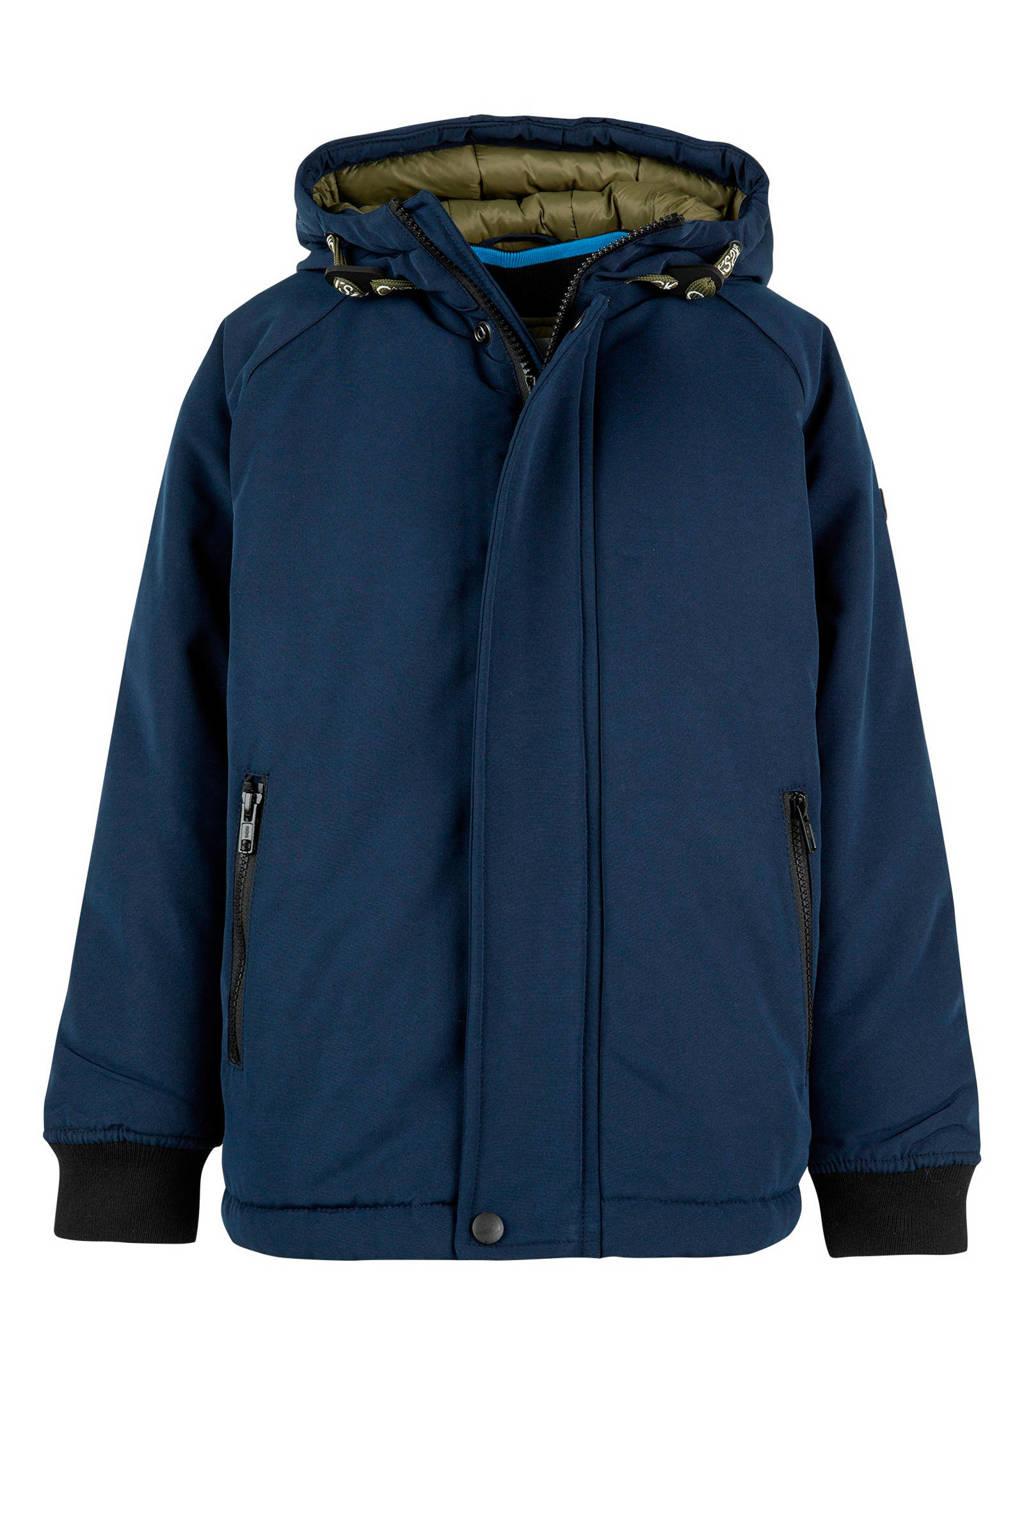 CKS KIDS winterjas met uitneembare bodywarmer, Donkerblauw/groen